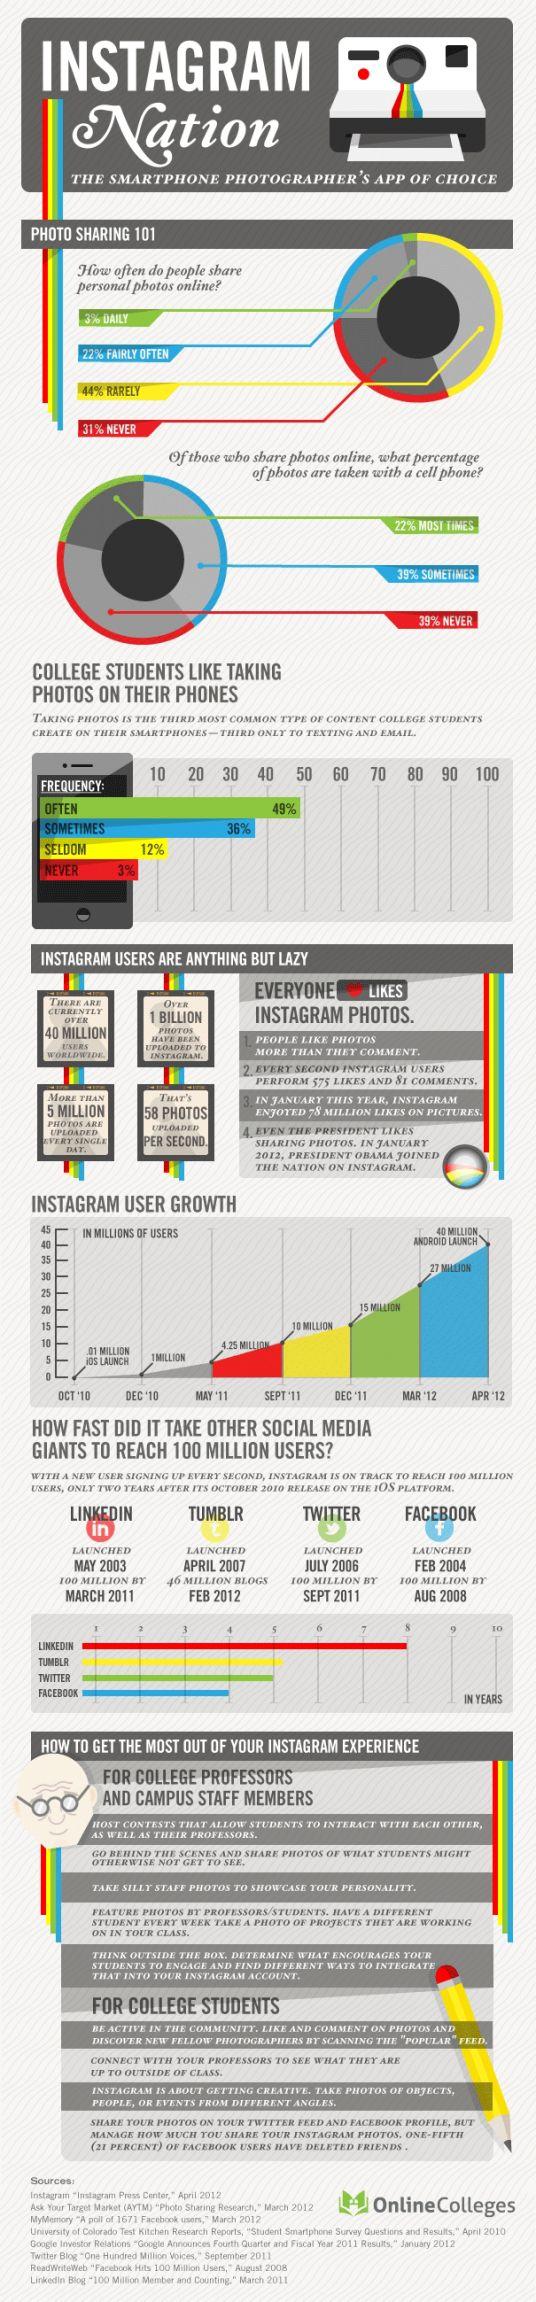 Instagram 2012 Infographic